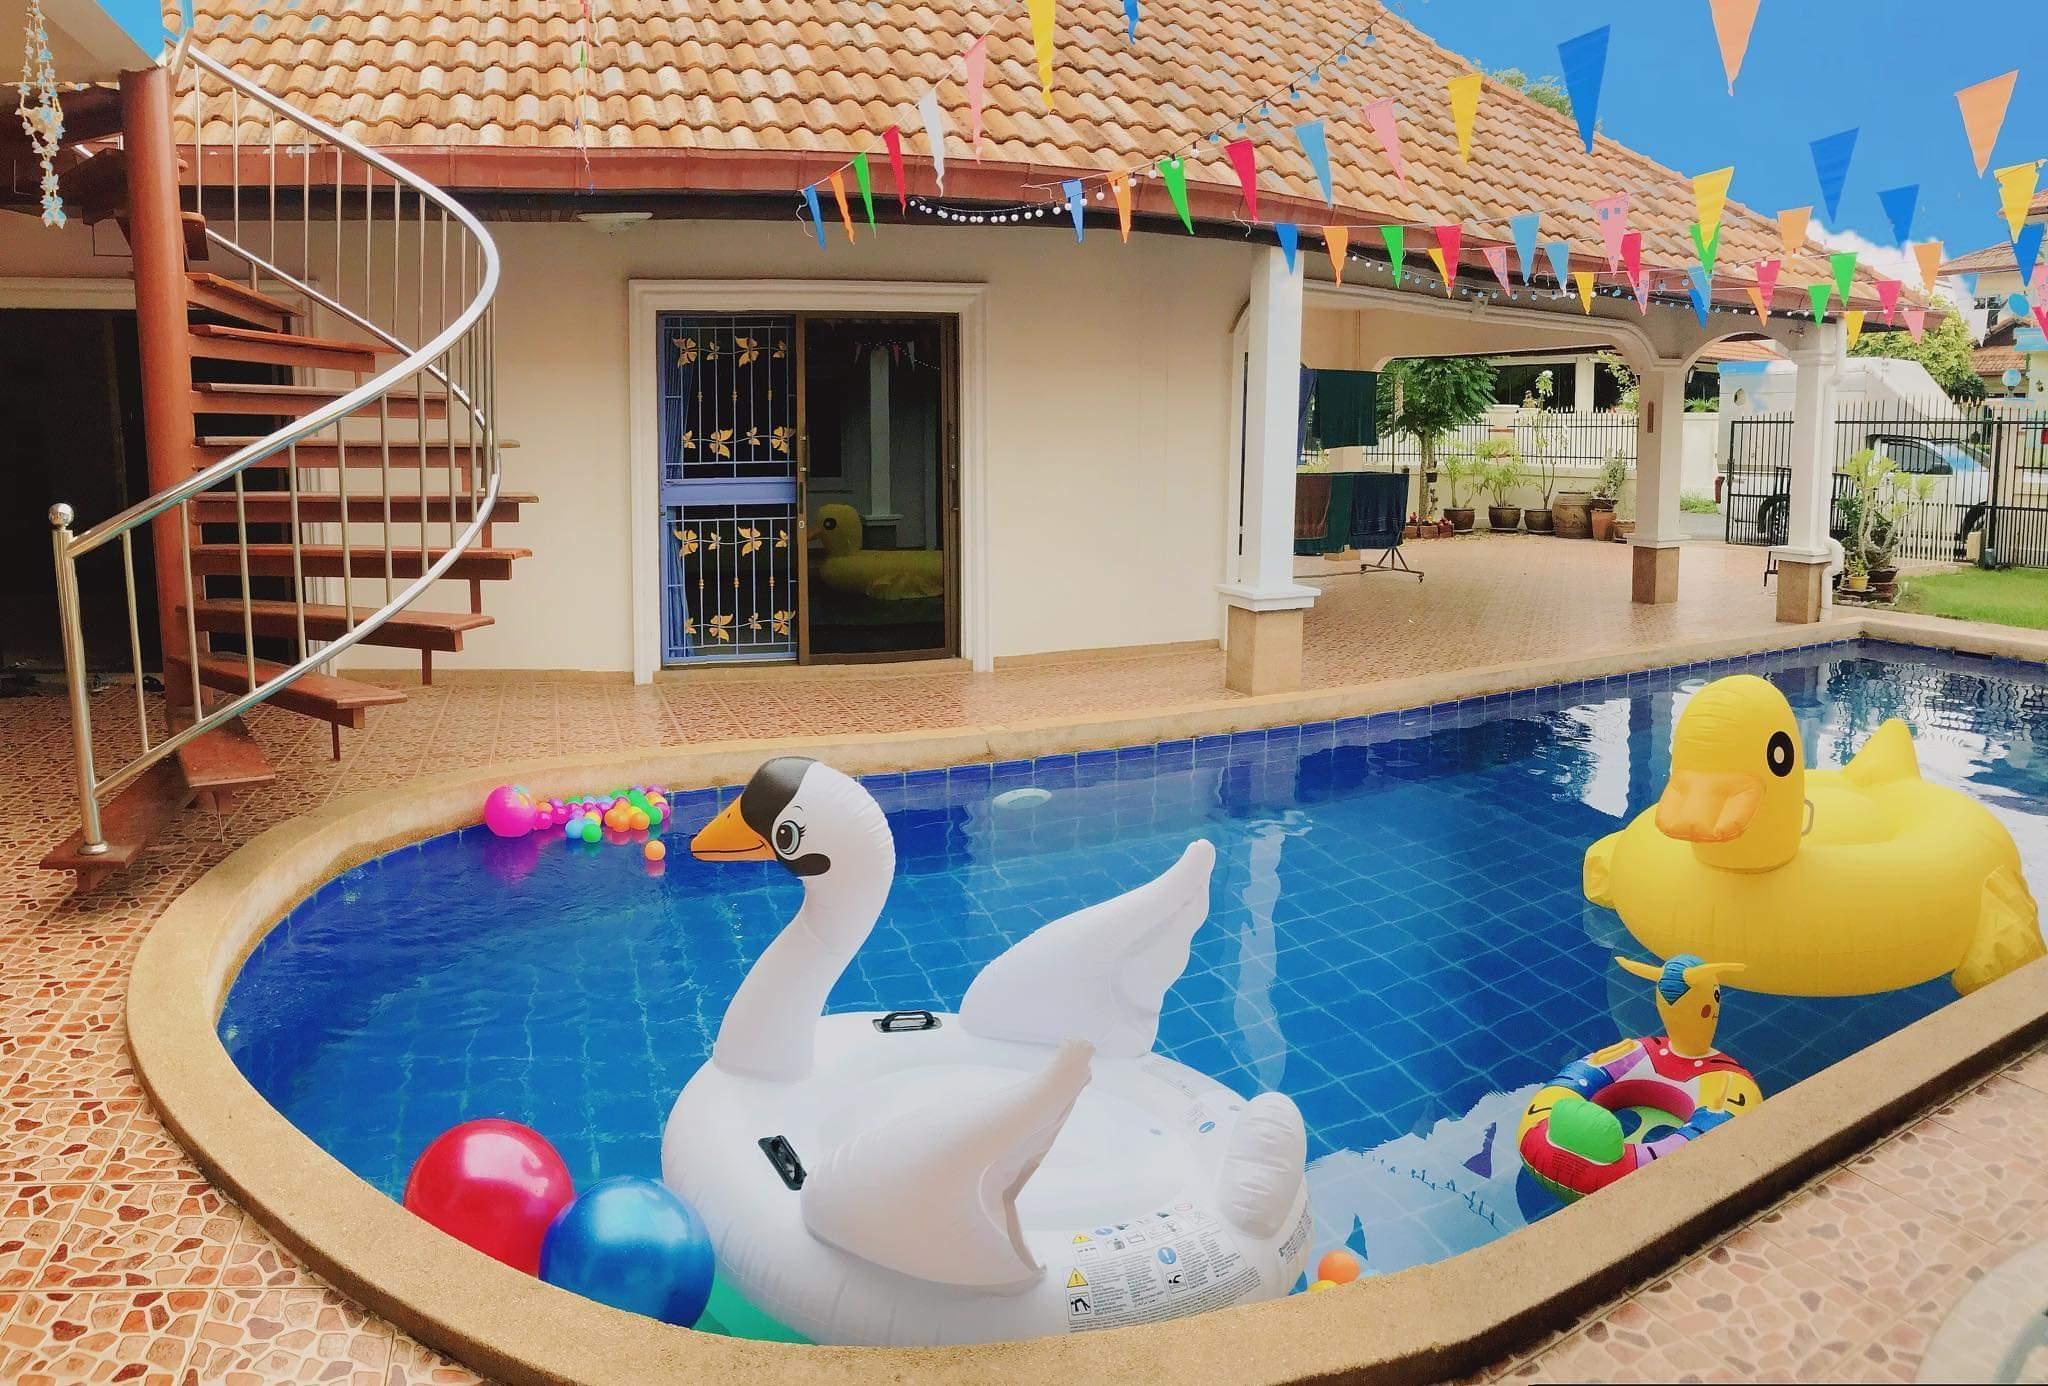 Pattaya Pool Villa By Arrowmini วิลลา 3 ห้องนอน 3 ห้องน้ำส่วนตัว ขนาด 700 ตร.ม. – มาบประชันเรเซอเวอร์